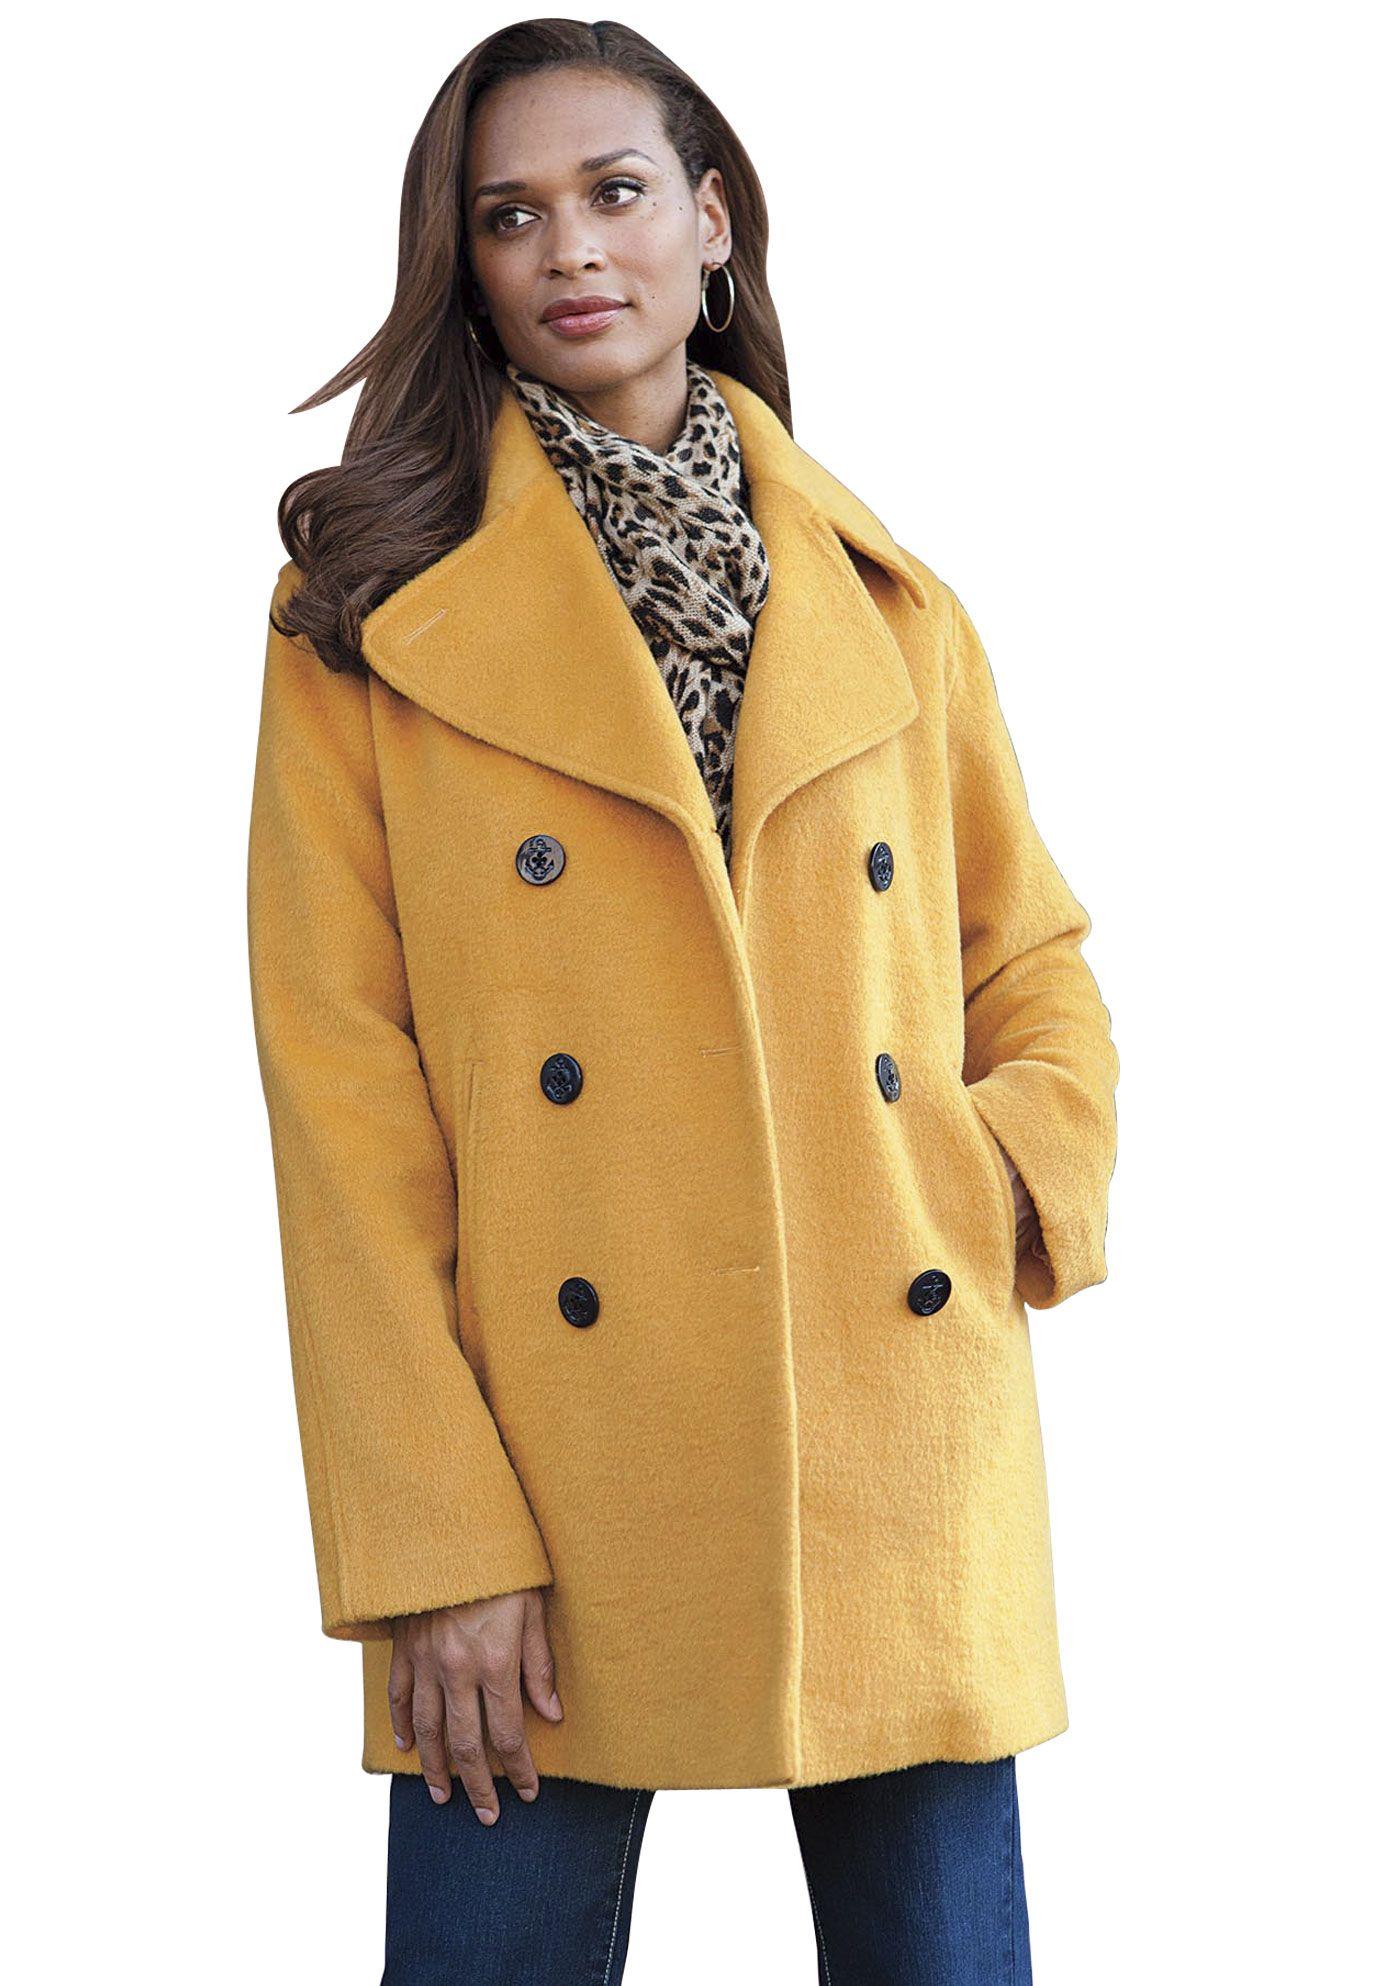 Plus Size Classic Wool Pea Coat image | MUSTARD ...